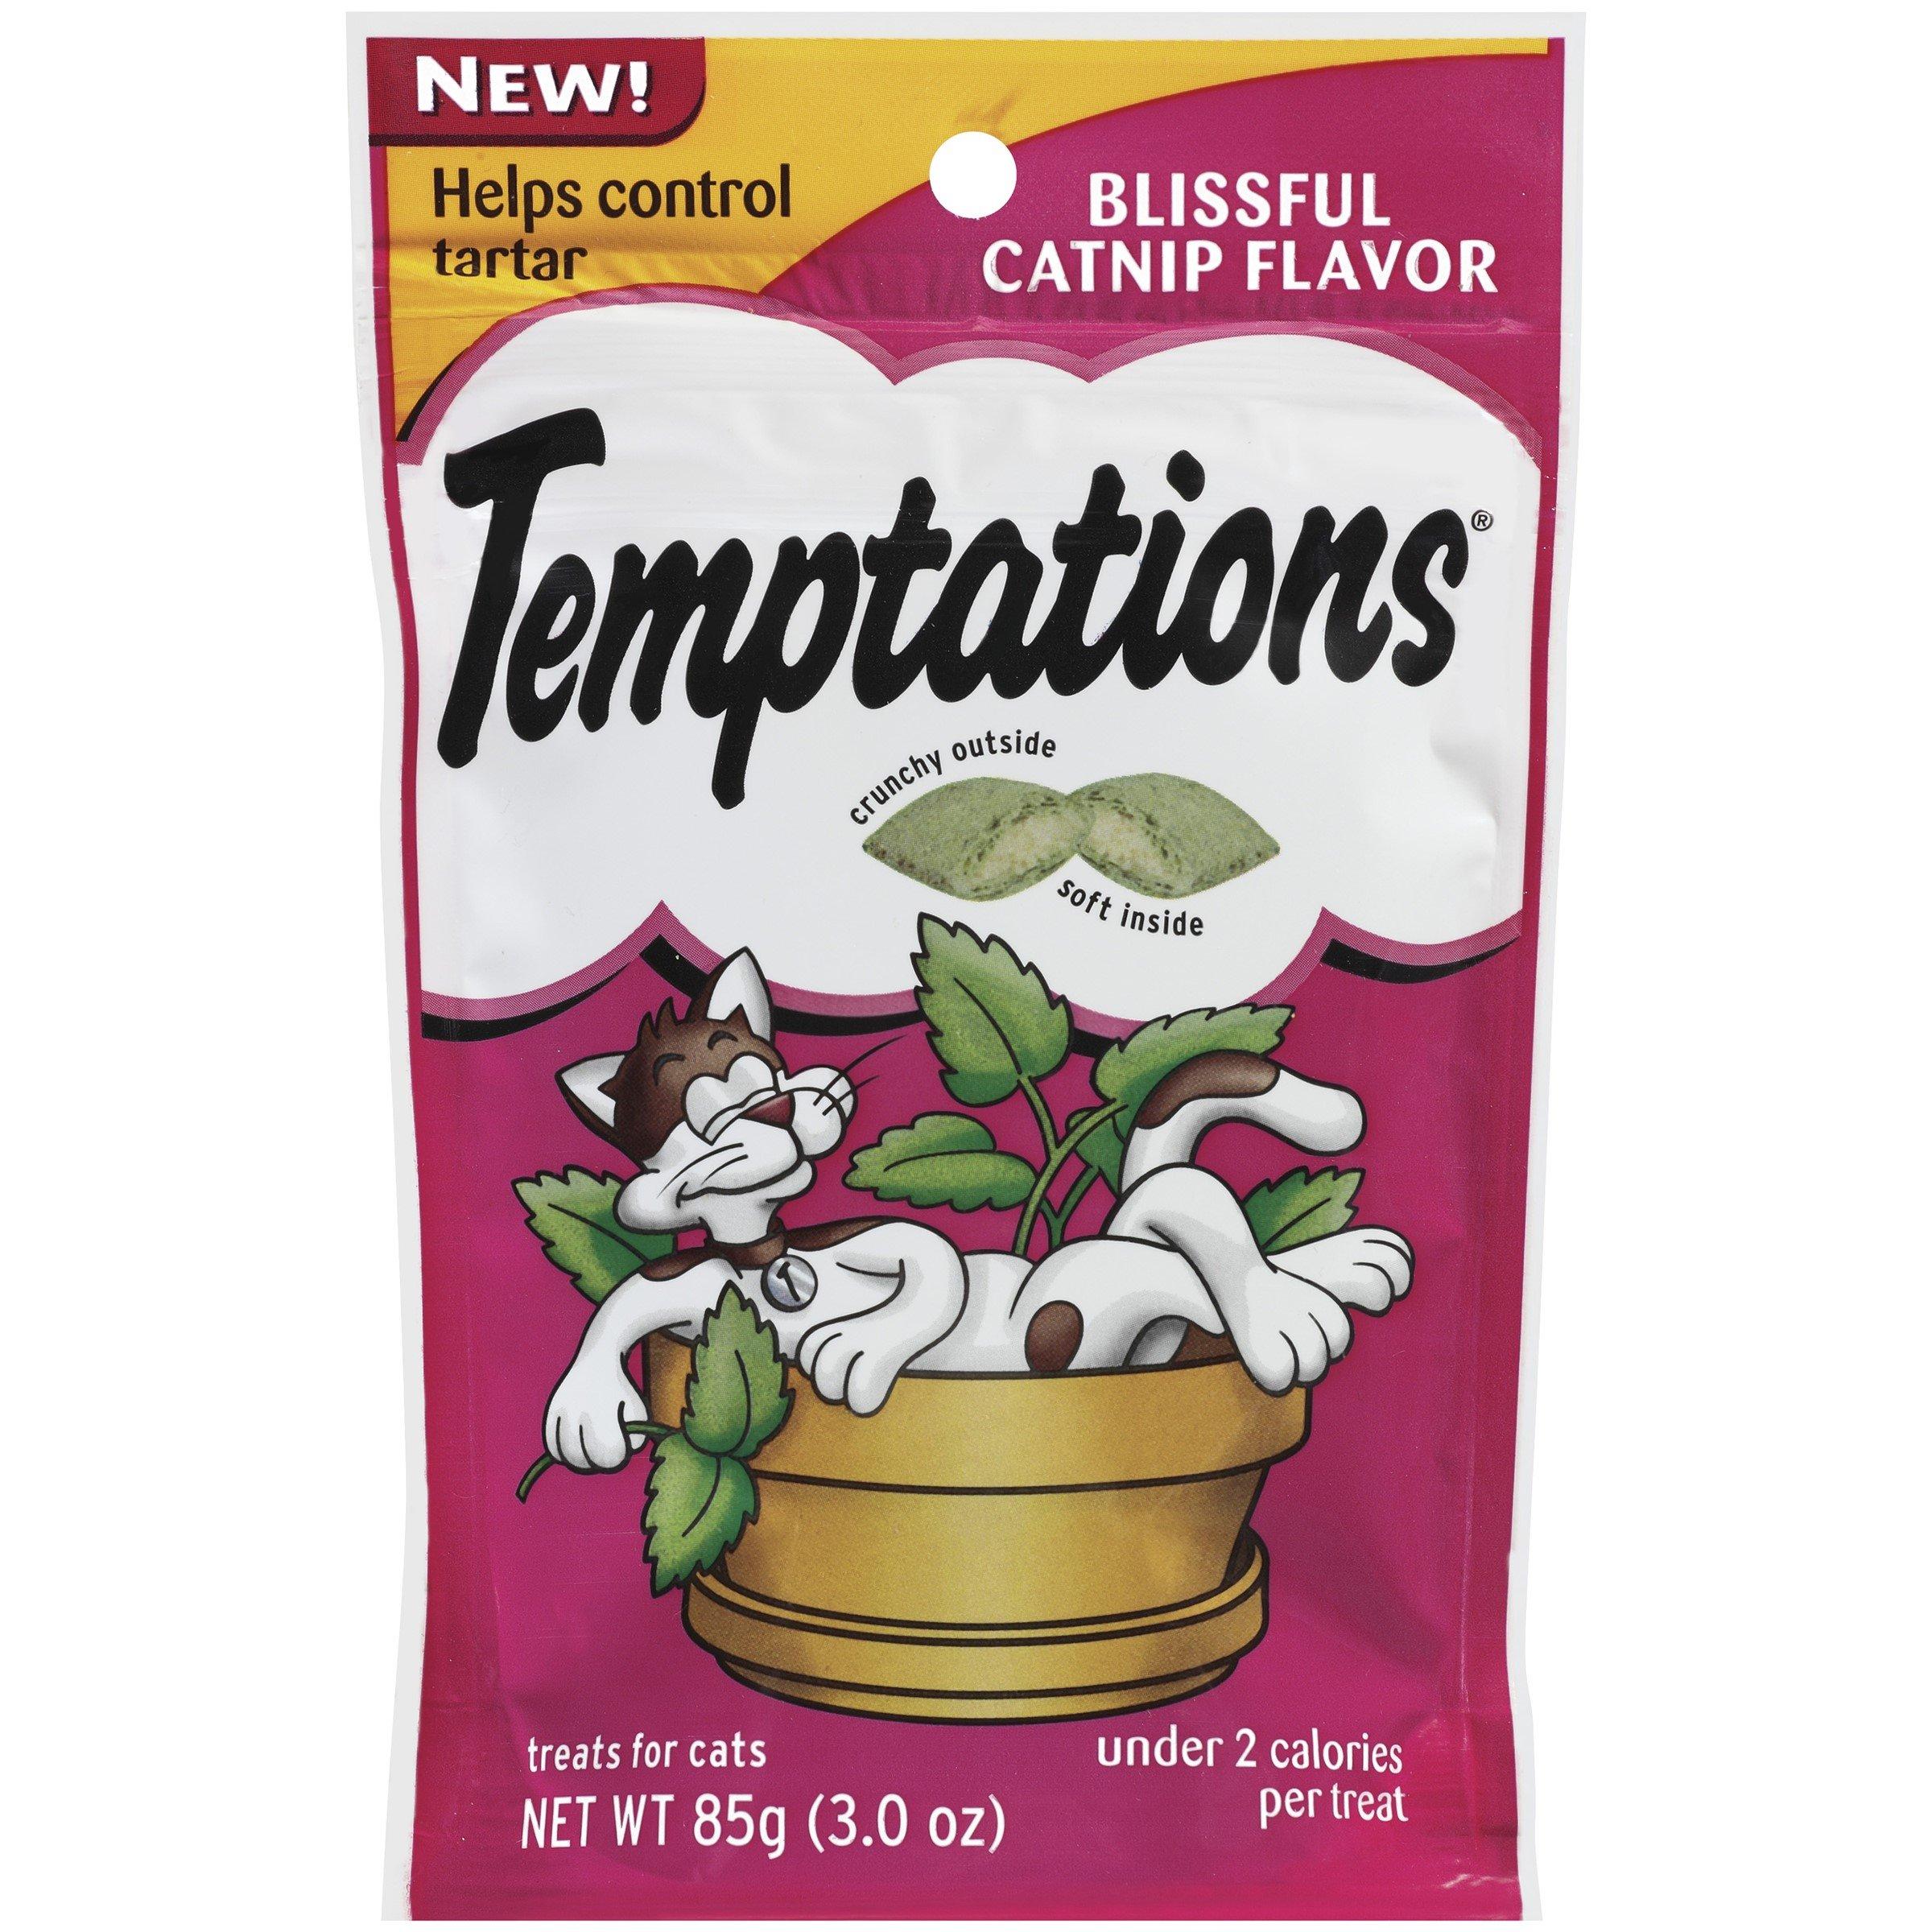 Smarty Kat Catnip Bundle, SmartyKat CatNip Mist 7 oz., 2 SmartyKat Skitter Critters CatNip Mice & 1 Temptations Blissful Catnip Flavor Treats 3 oz.